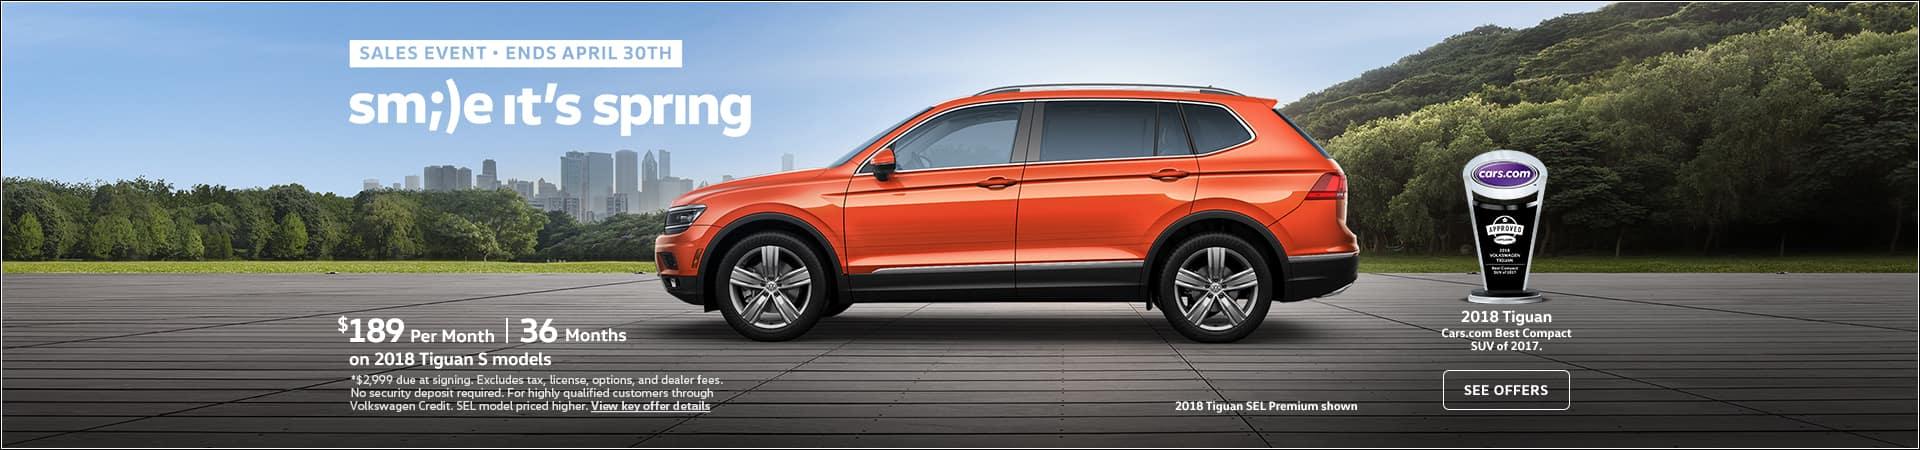 Larry Roesch Volkswagen | New & Used VW Dealer | Bensenville, IL